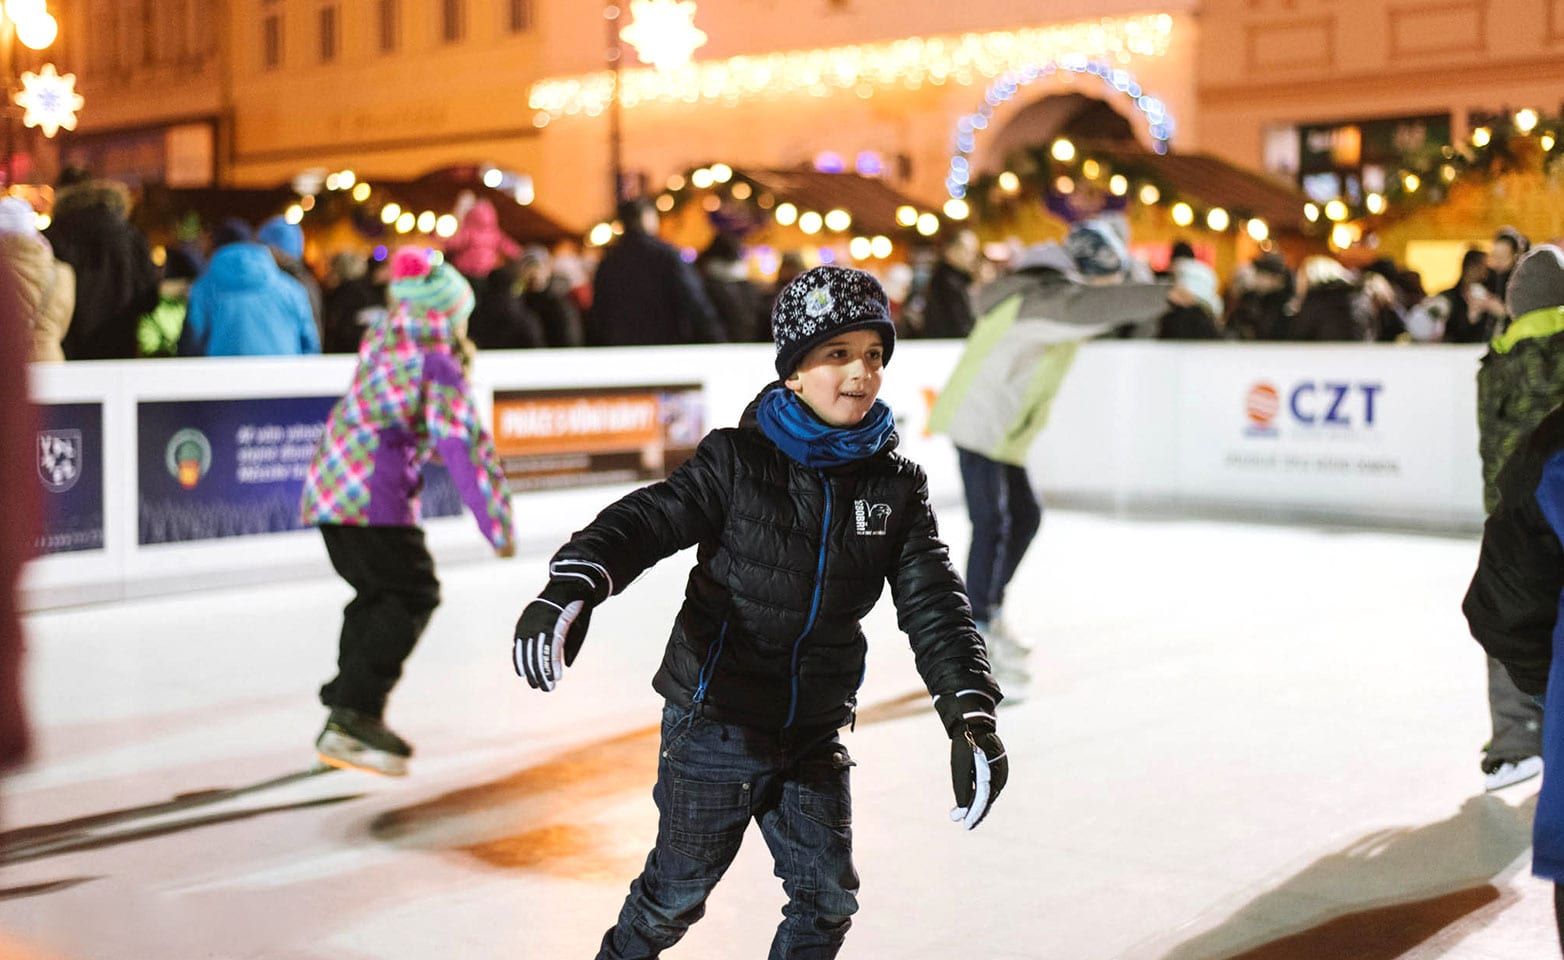 Christmas Village Ice Skating Rink.Winter Christmas Blues Ade Winterdorf In Winterberg Offers Besides